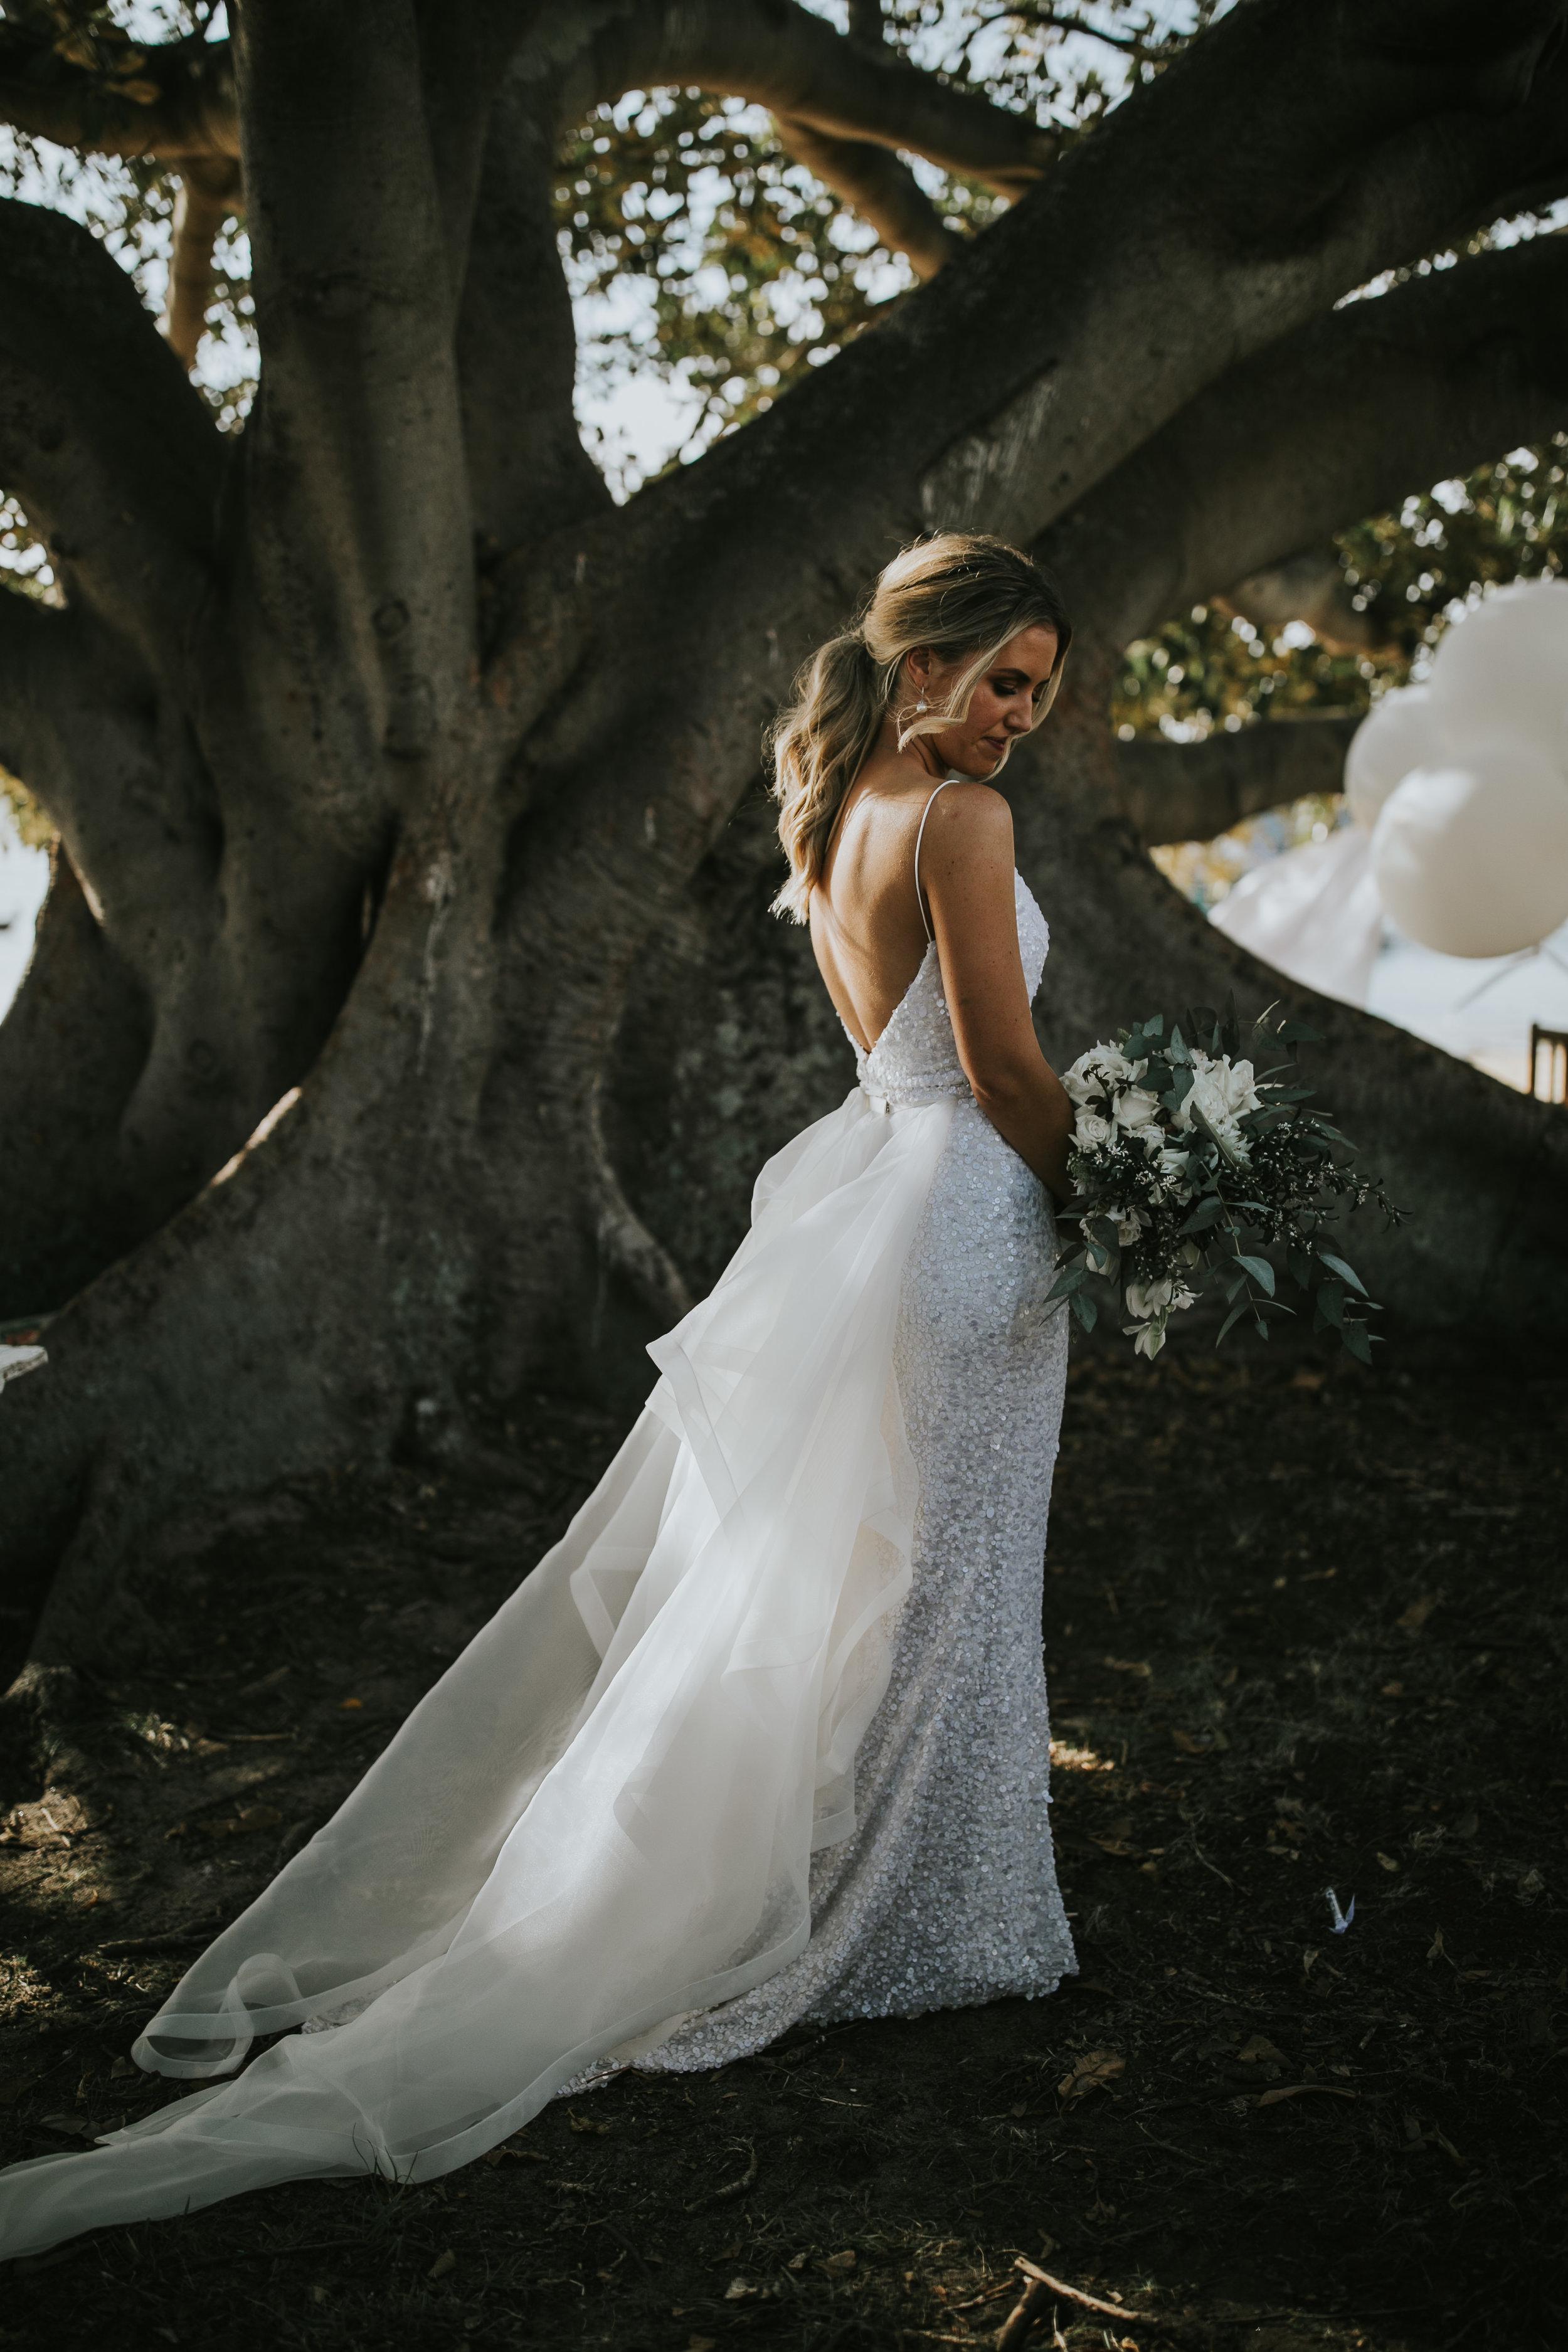 Sara - the stunning bride!